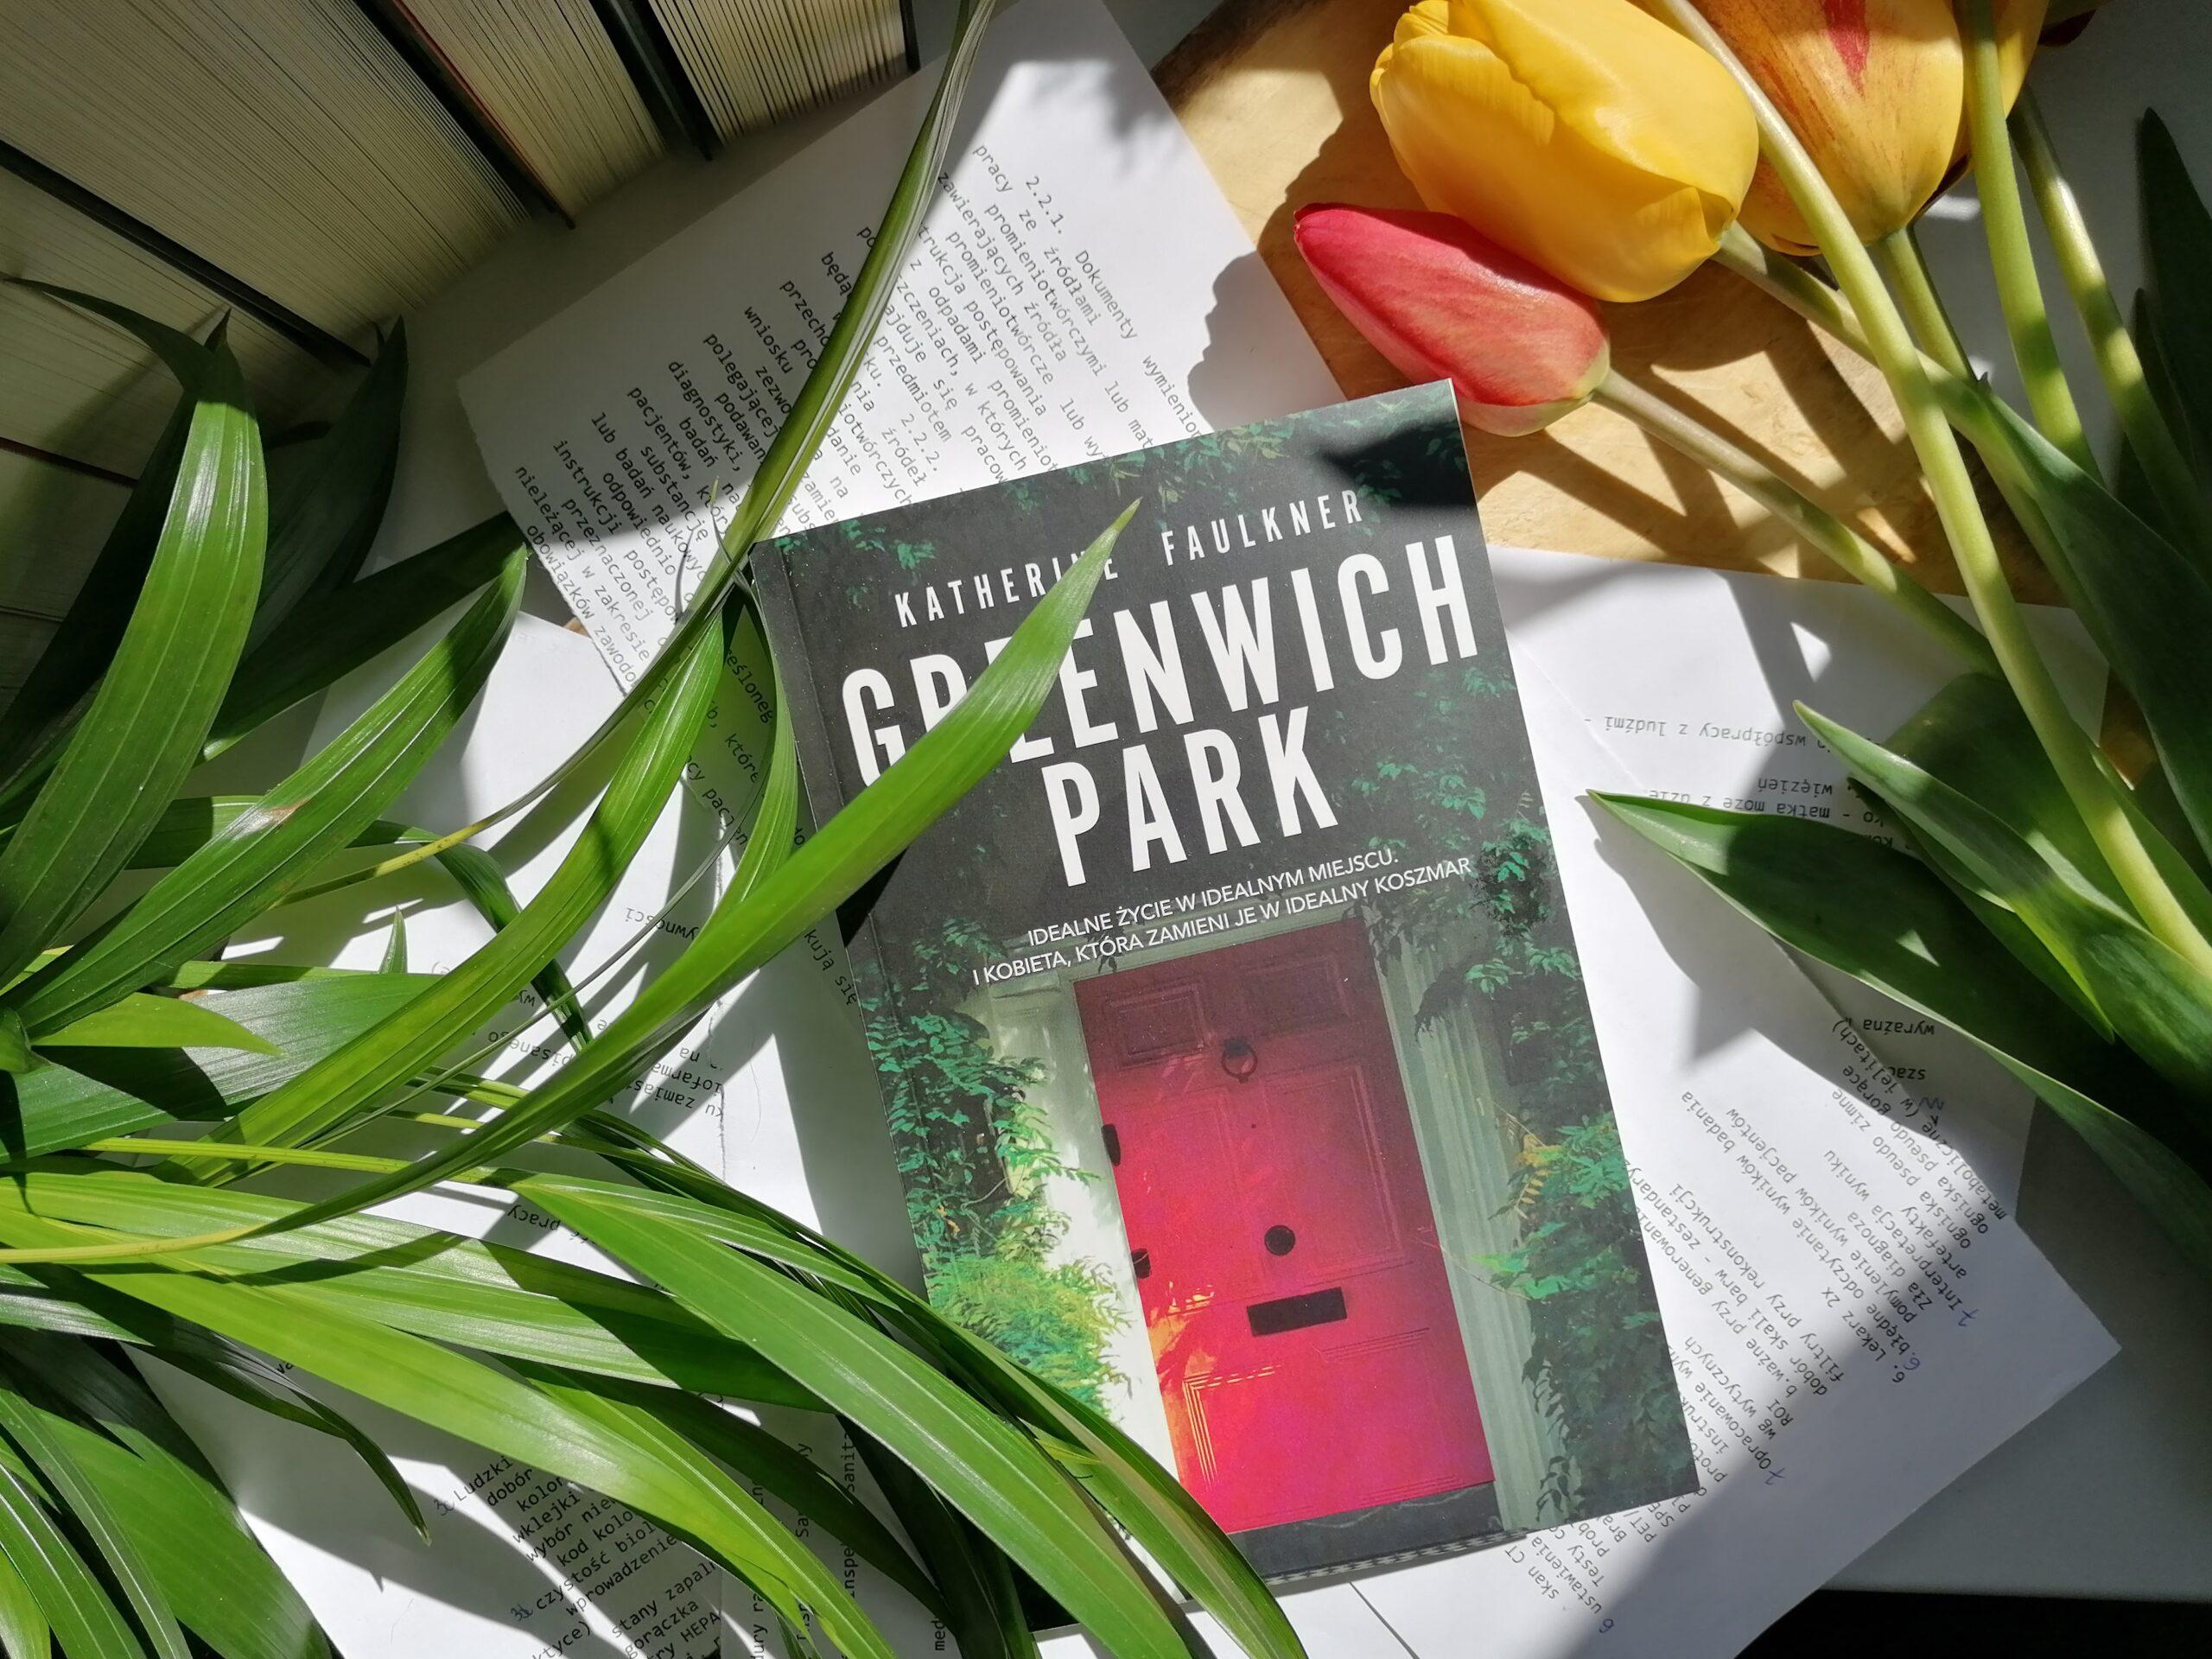 Recenzja: Greenwich Park - Katherine Faulkner